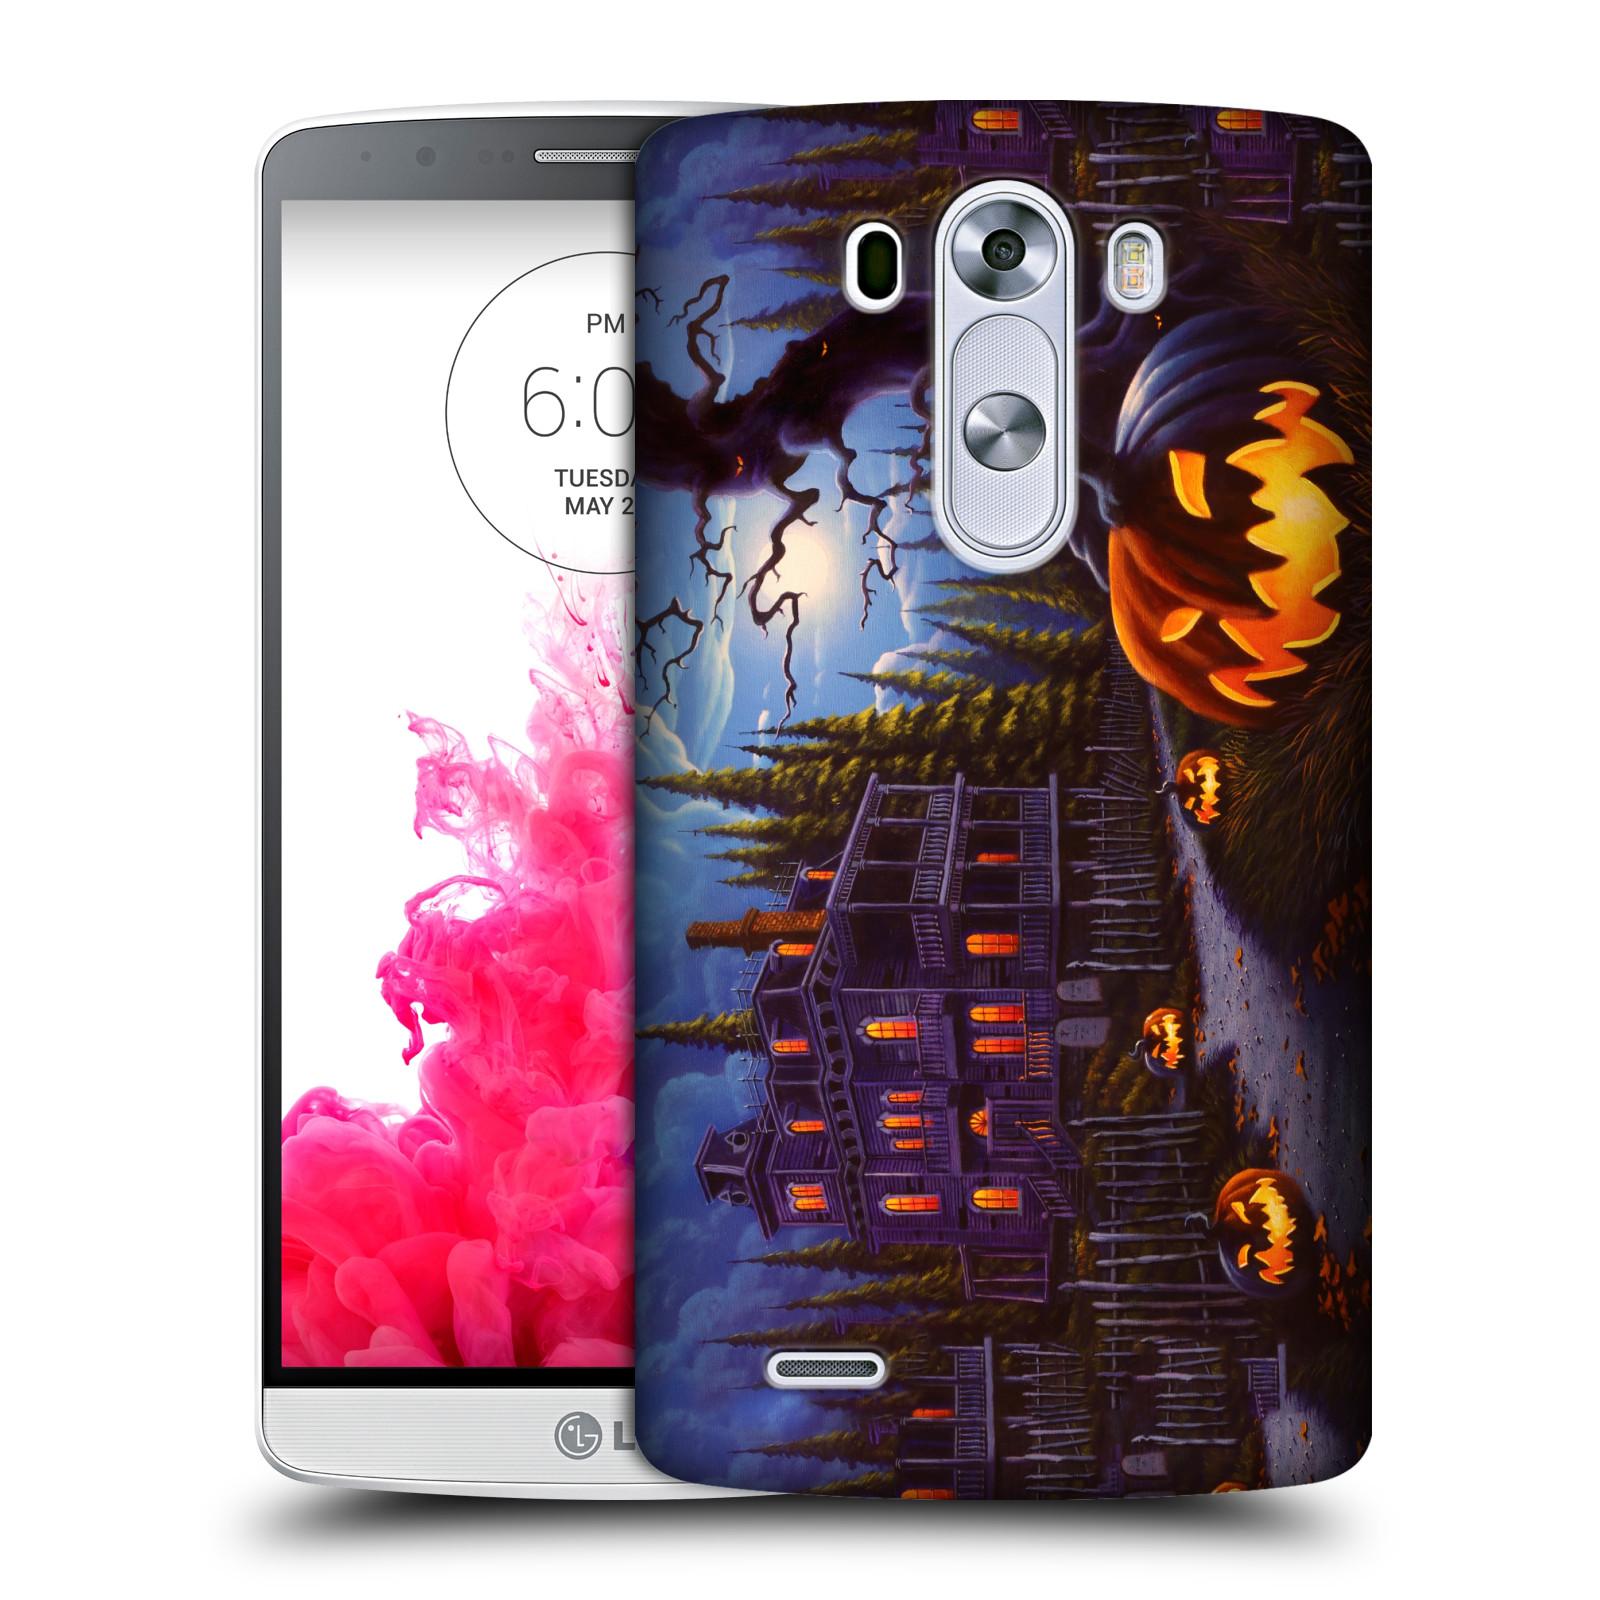 OFFICIAL-GENO-PEOPLES-ART-HALLOWEEN-HARD-BACK-CASE-FOR-LG-PHONES-1